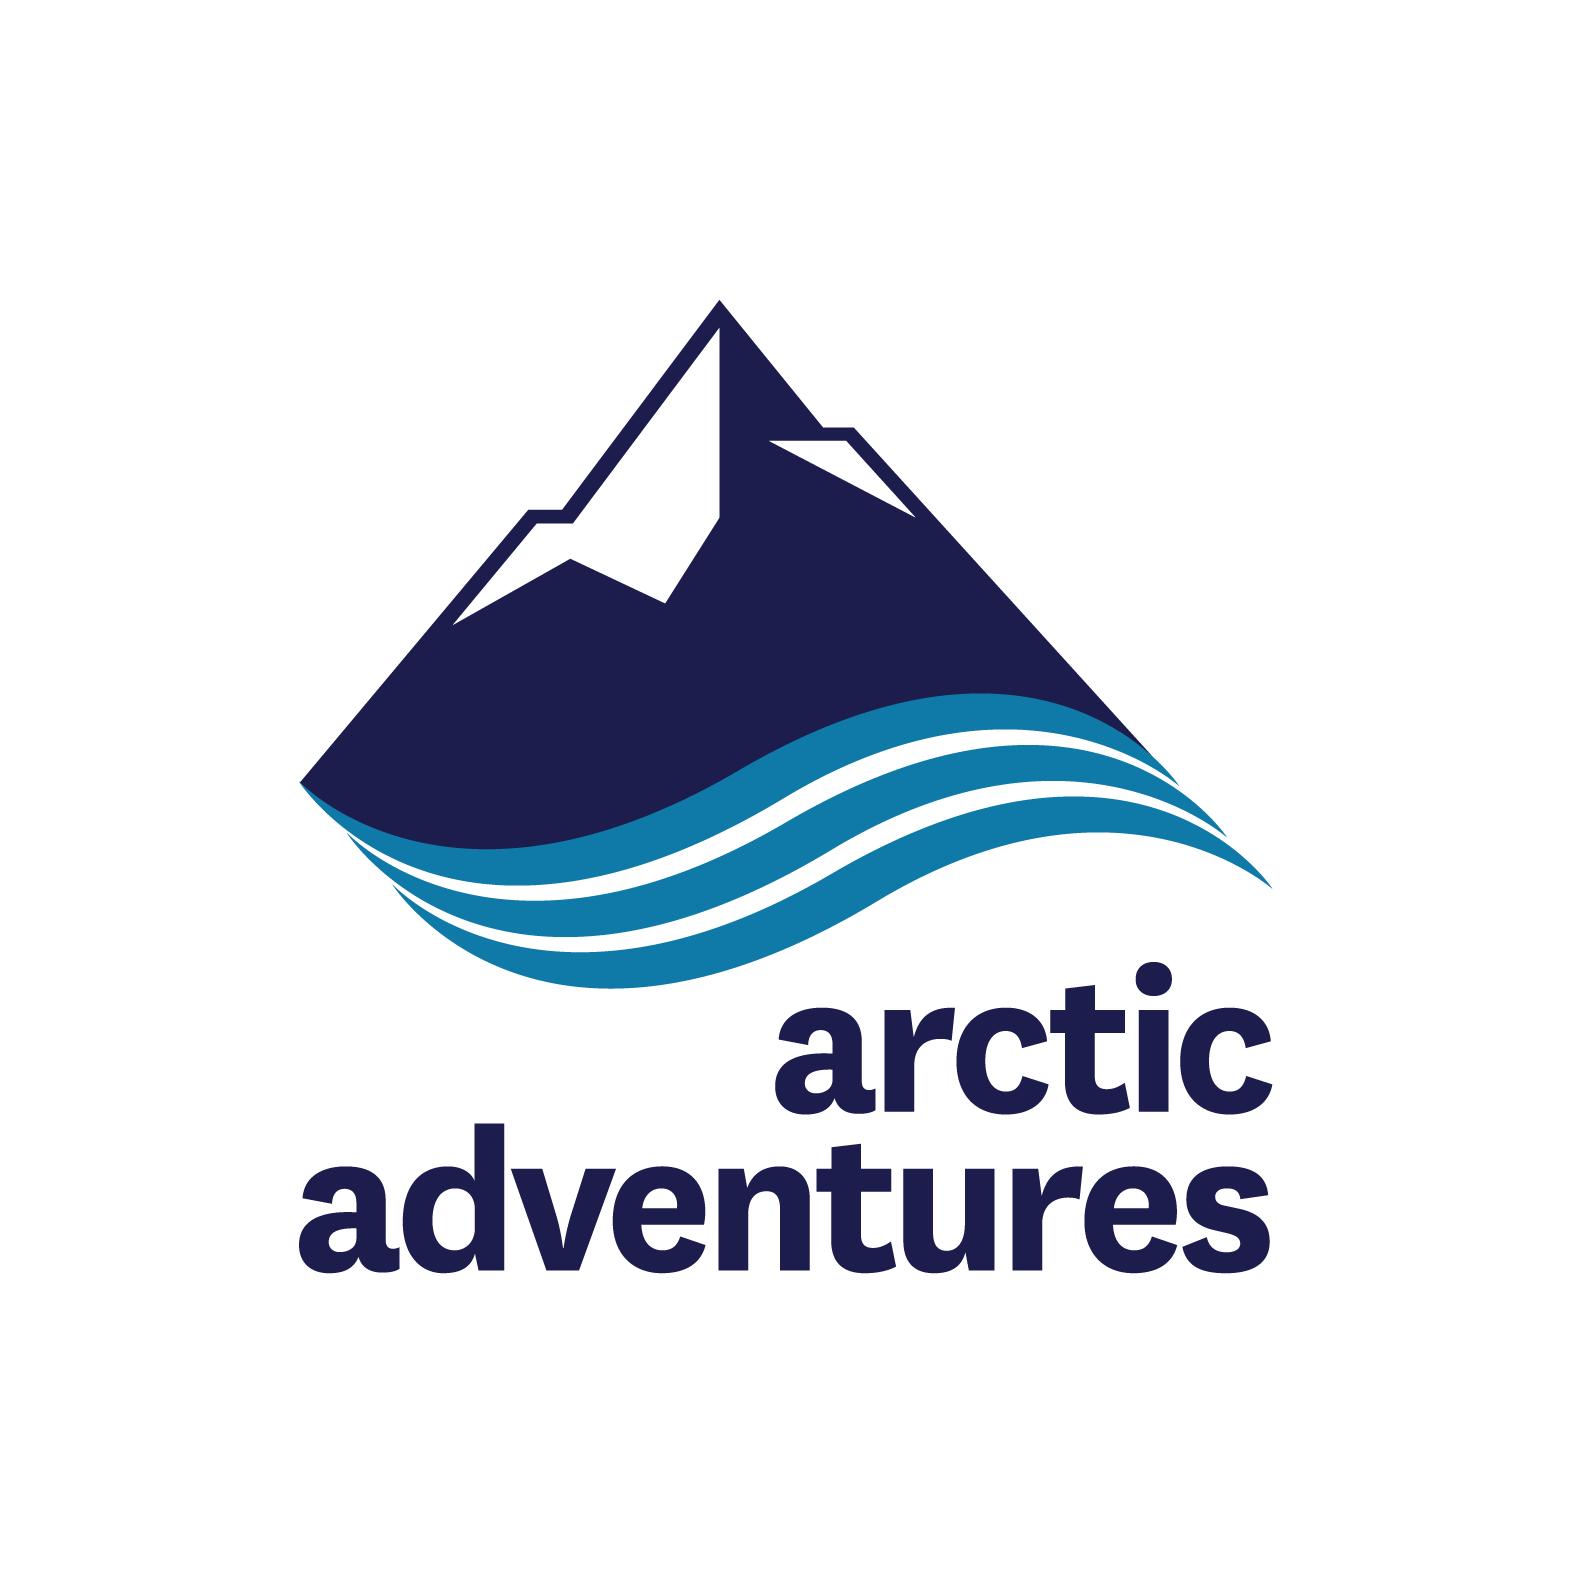 Arctic Adventures logo white